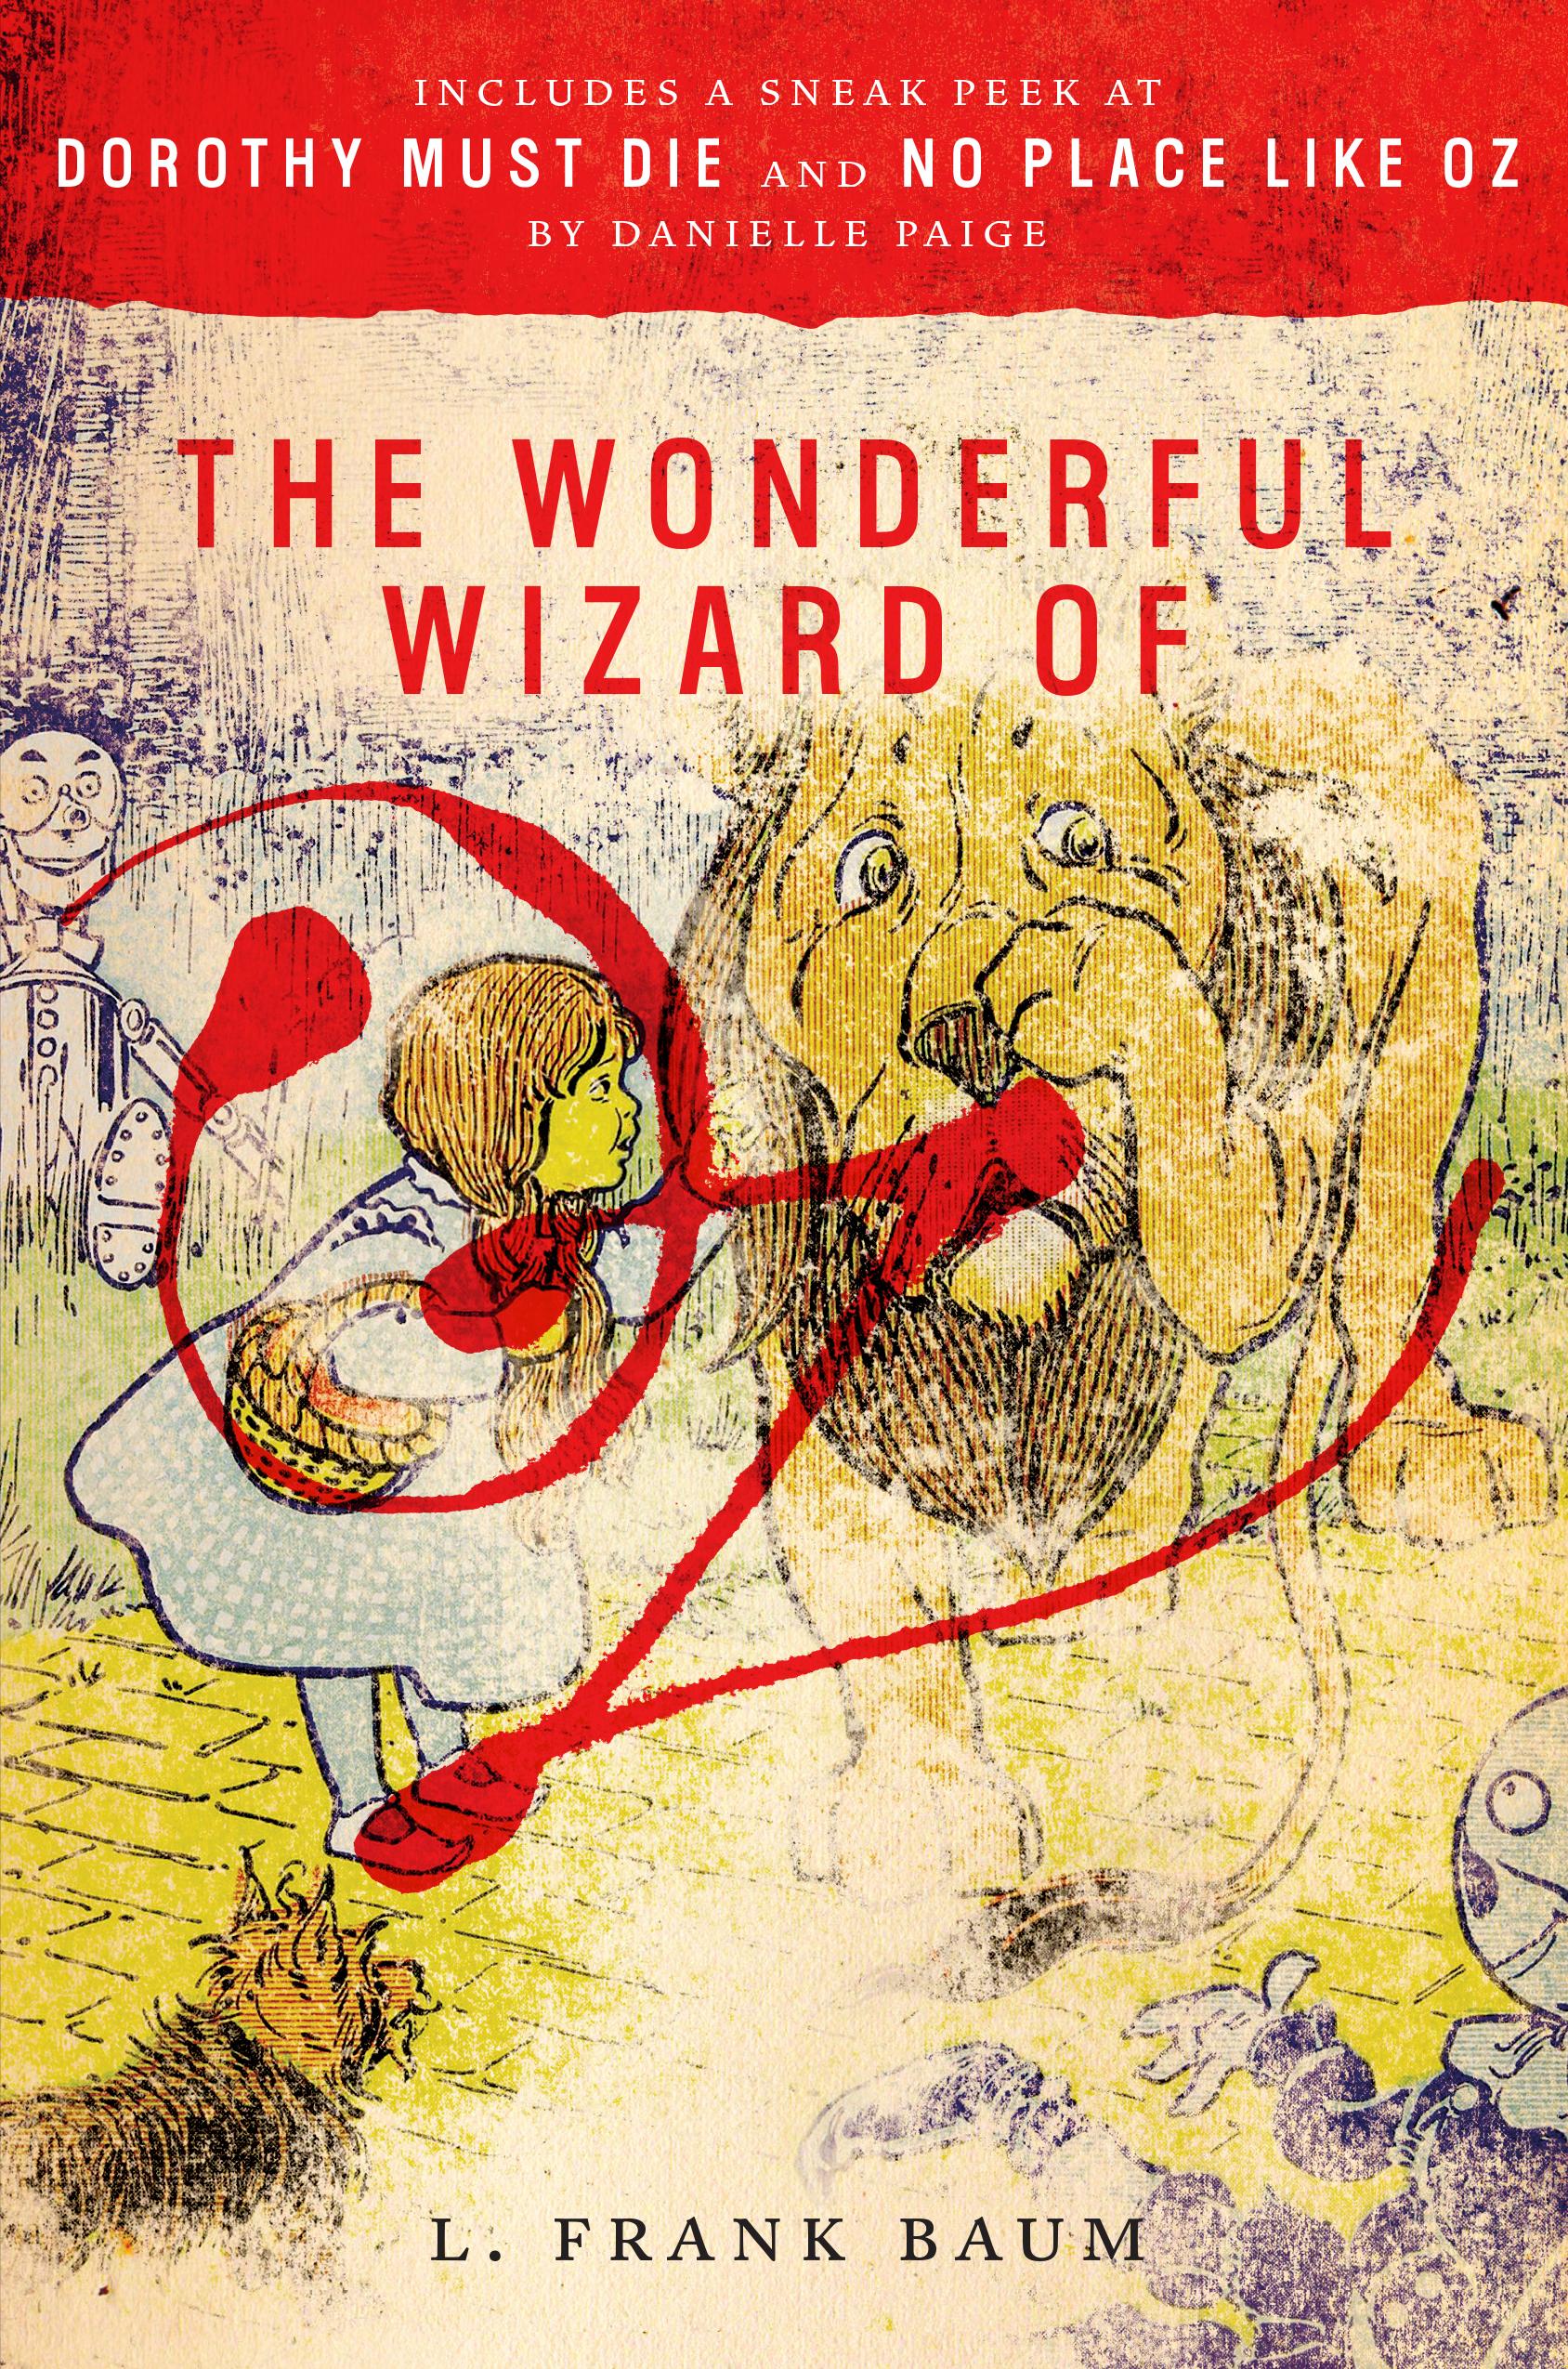 Ray Shappell_The Wonderful Wizard of Oz Epub c.jpg